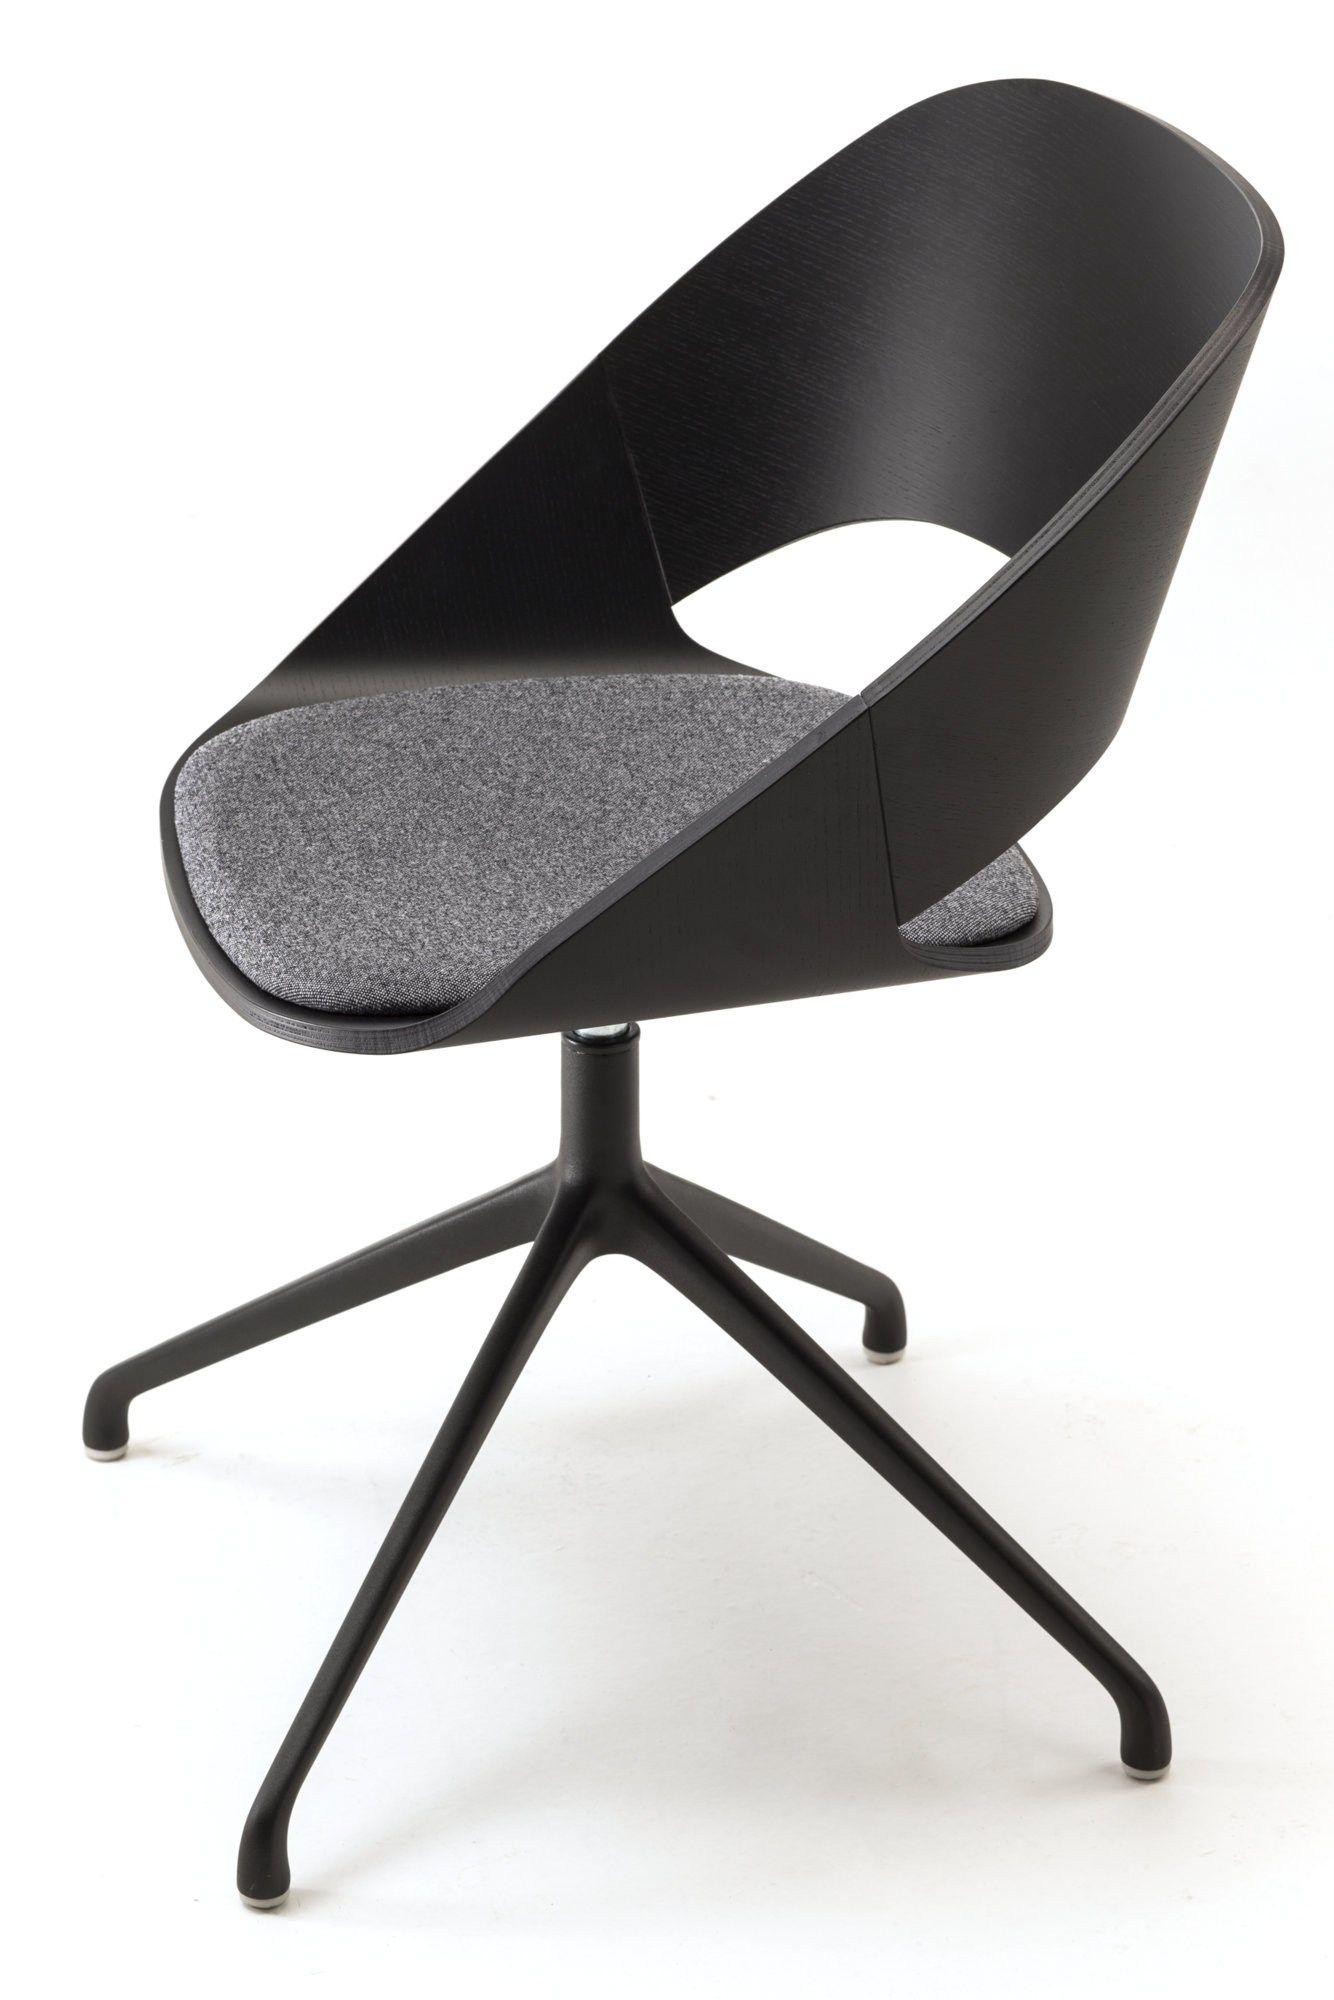 Schön KABIRA SP   4 Speichen  Stuhl Kollektion Kabira By Arrmet Design Kensaku  Oshiro